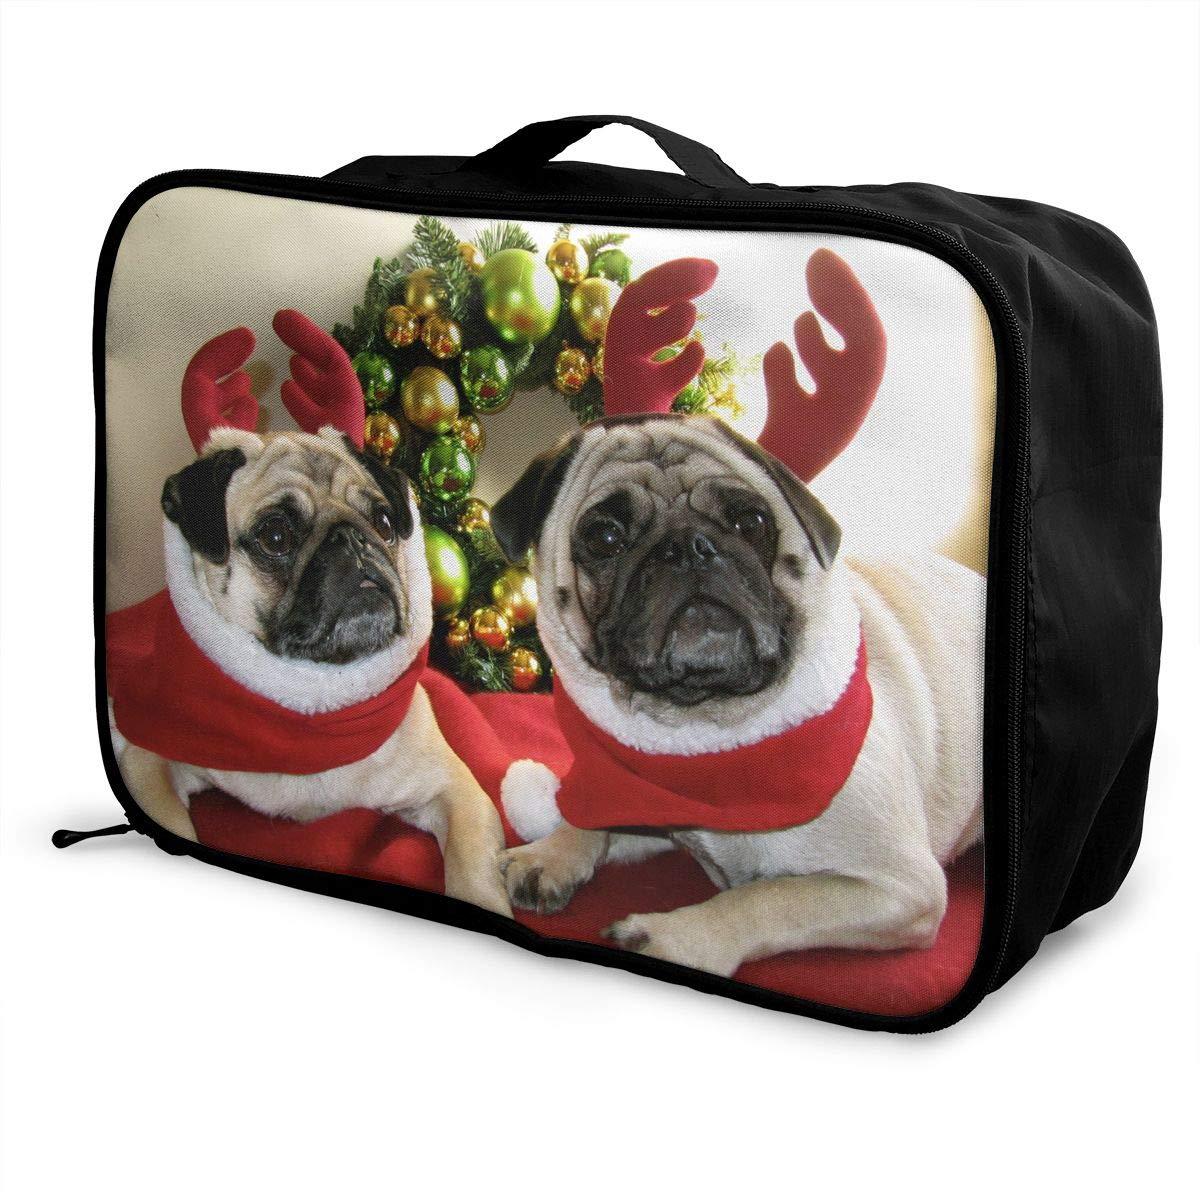 SSZW Christmas Pug Travel Duffel Bag Waterproof Fashion Lightweight Large Capacity Portable Luggage Bag